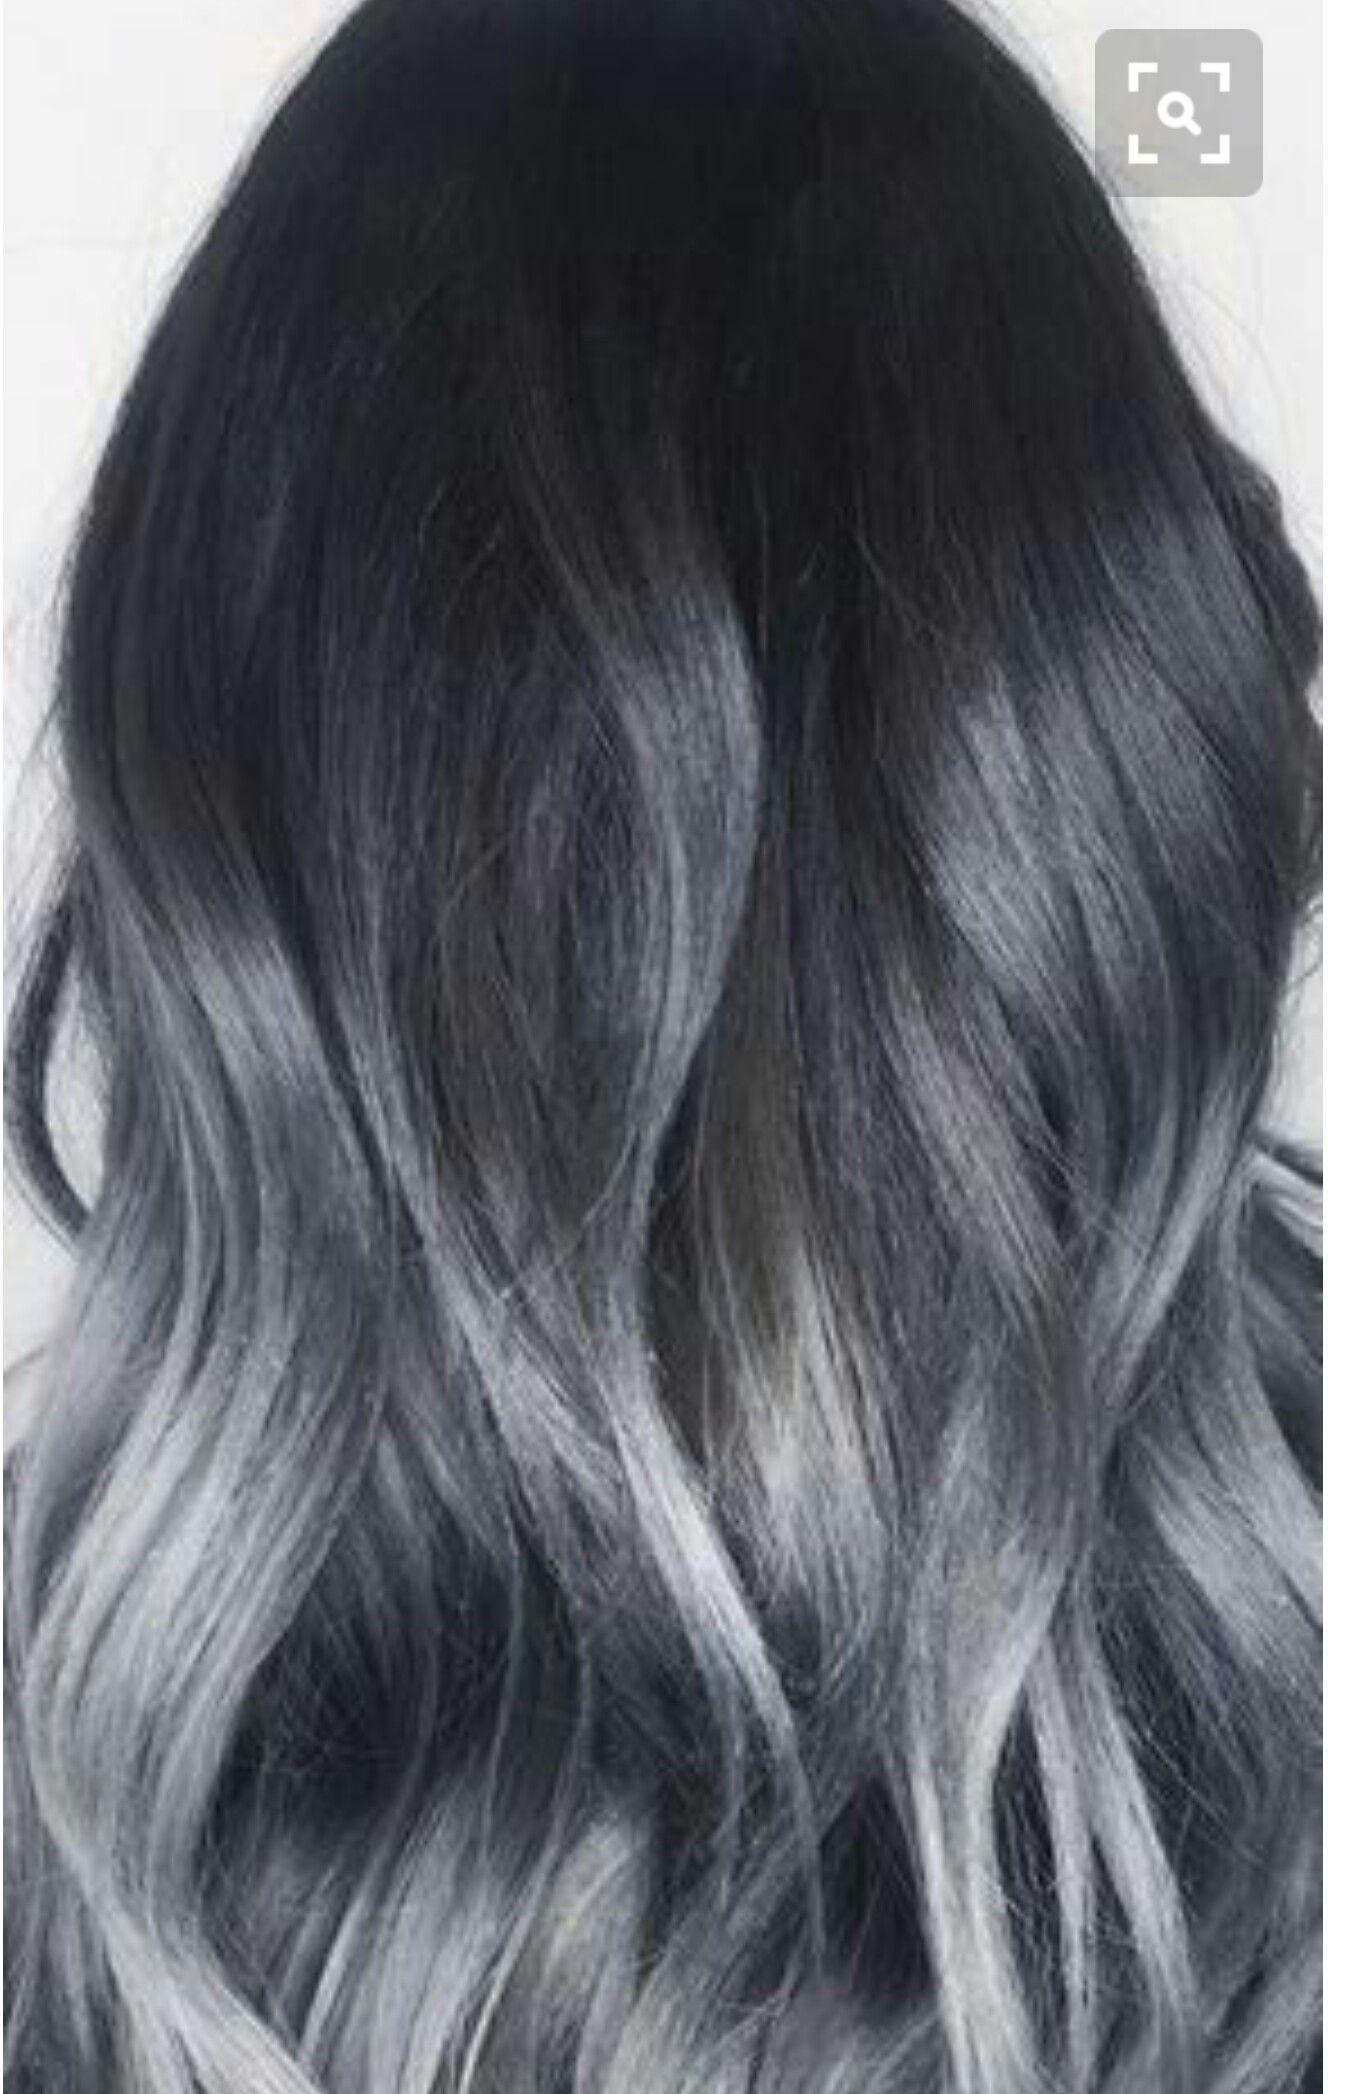 Silver Hair Pinterest Hair Coloring Hair Style And Hair Goals